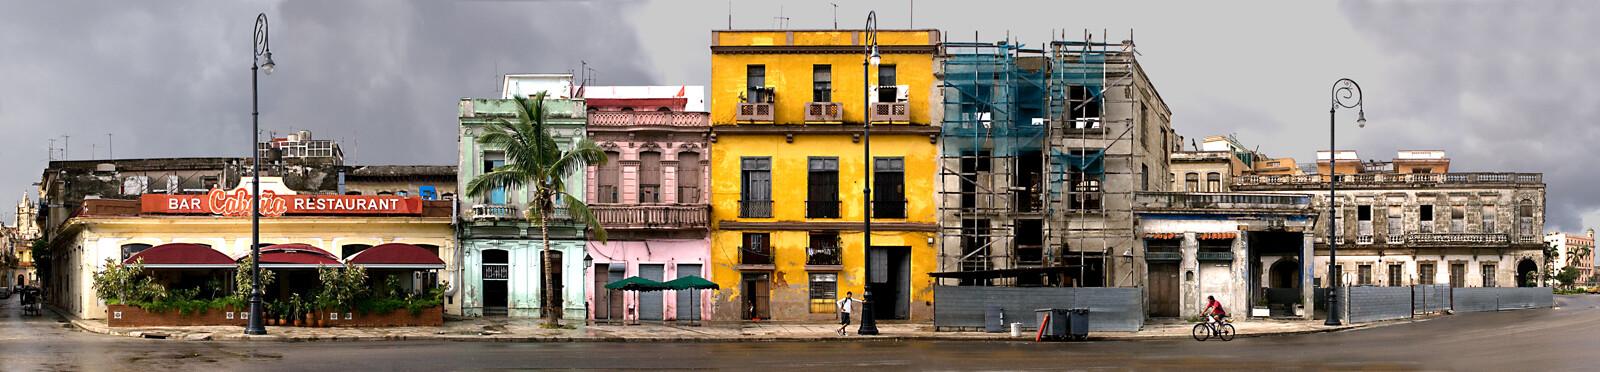 Avenida Cuba #2 - Larry Yust